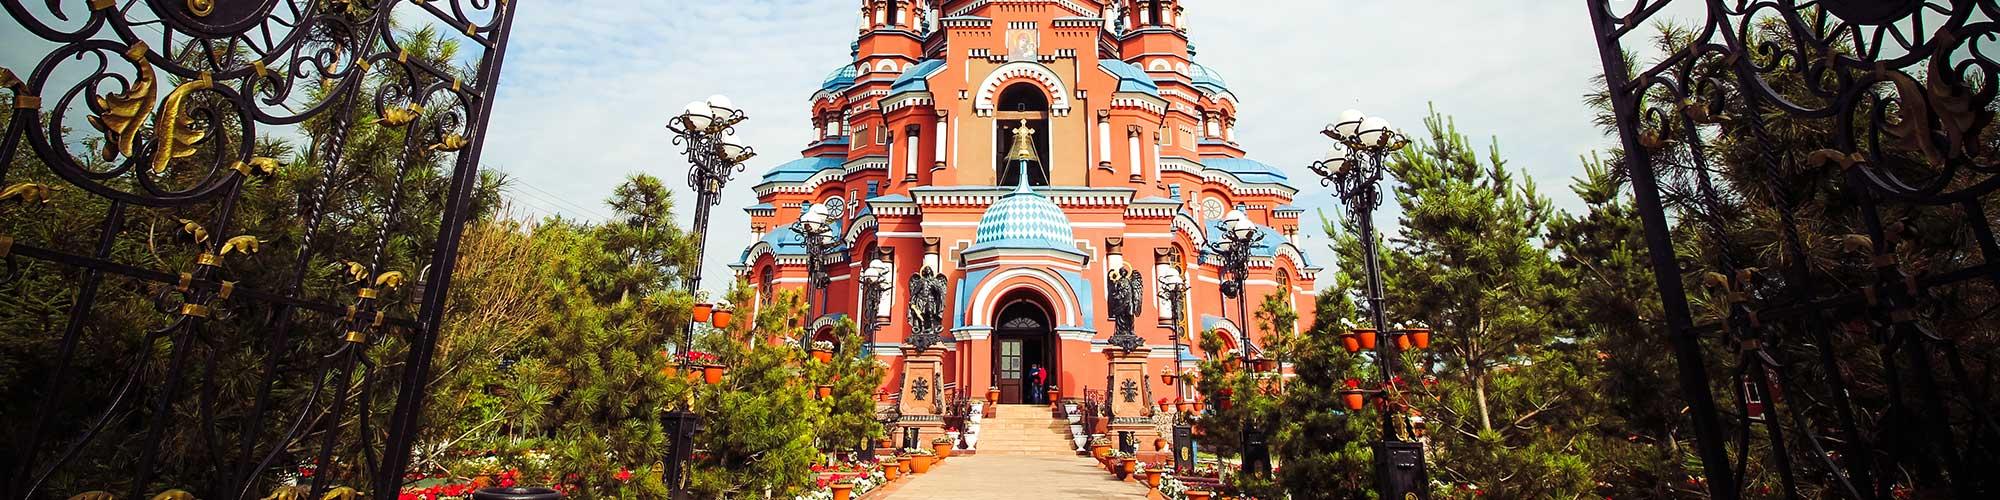 Transiveriano Moscú-Pekín. Del Kremlin a la Gran Muralla - El Pais Viajes